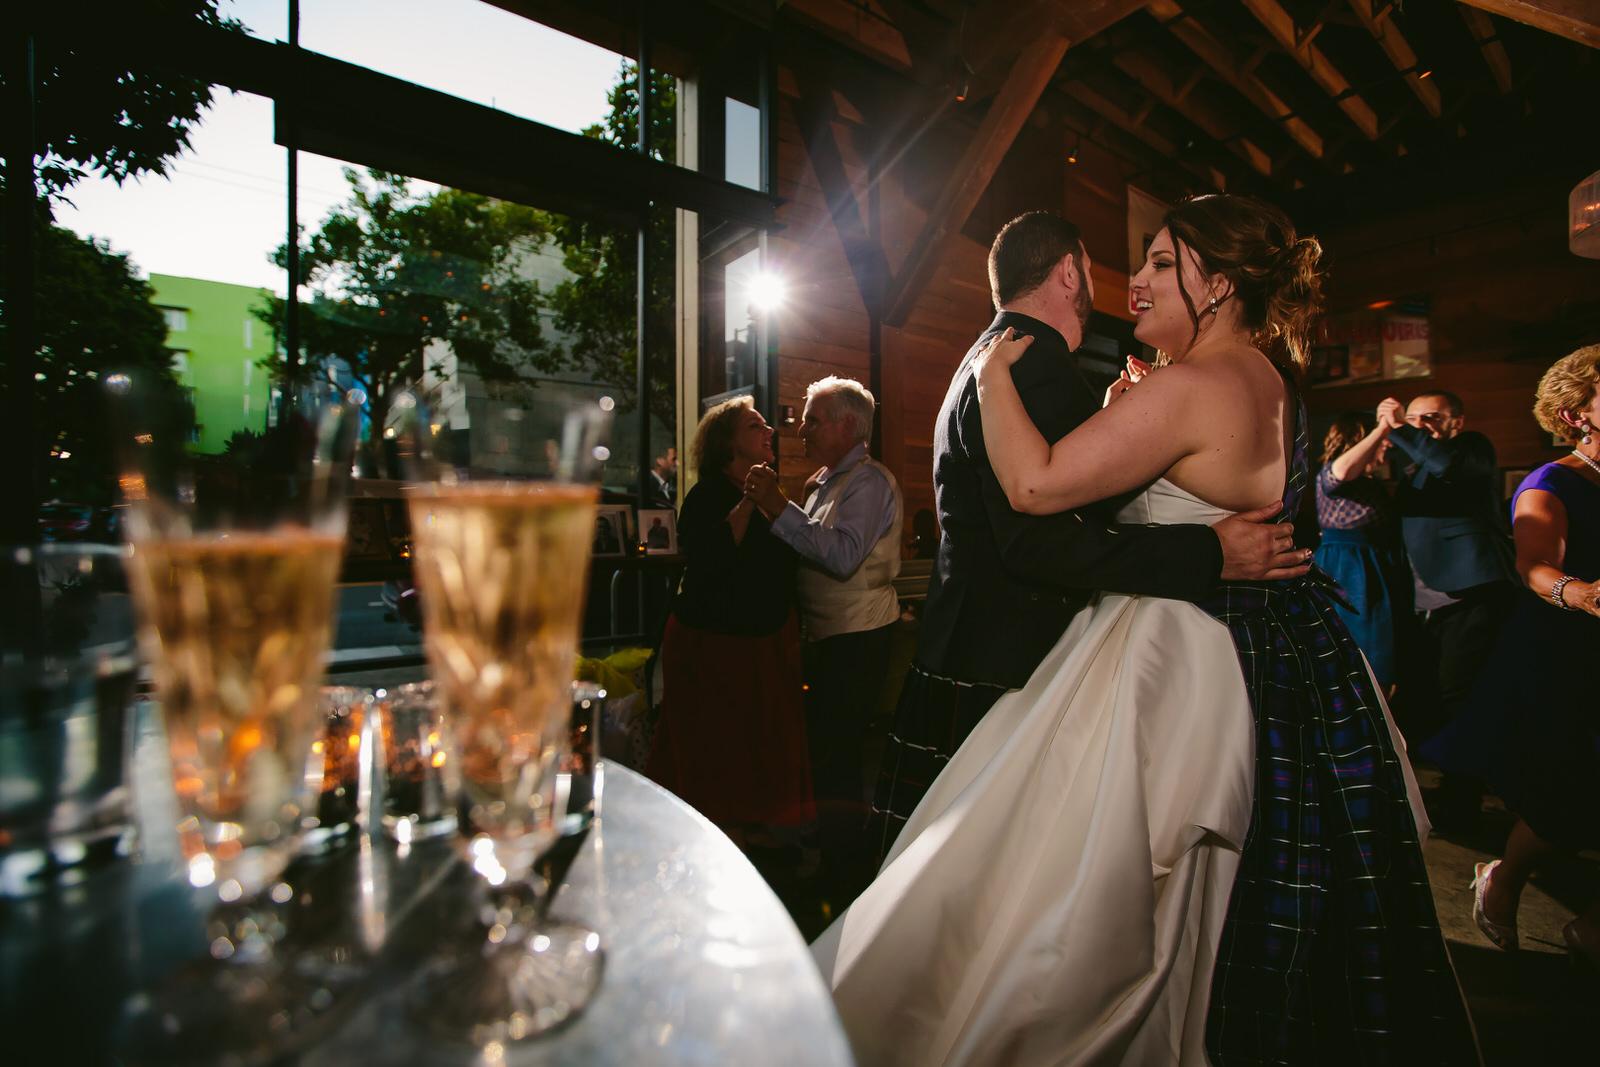 bay_area_wedding_photographer_first_dance_bride_groom.jpg